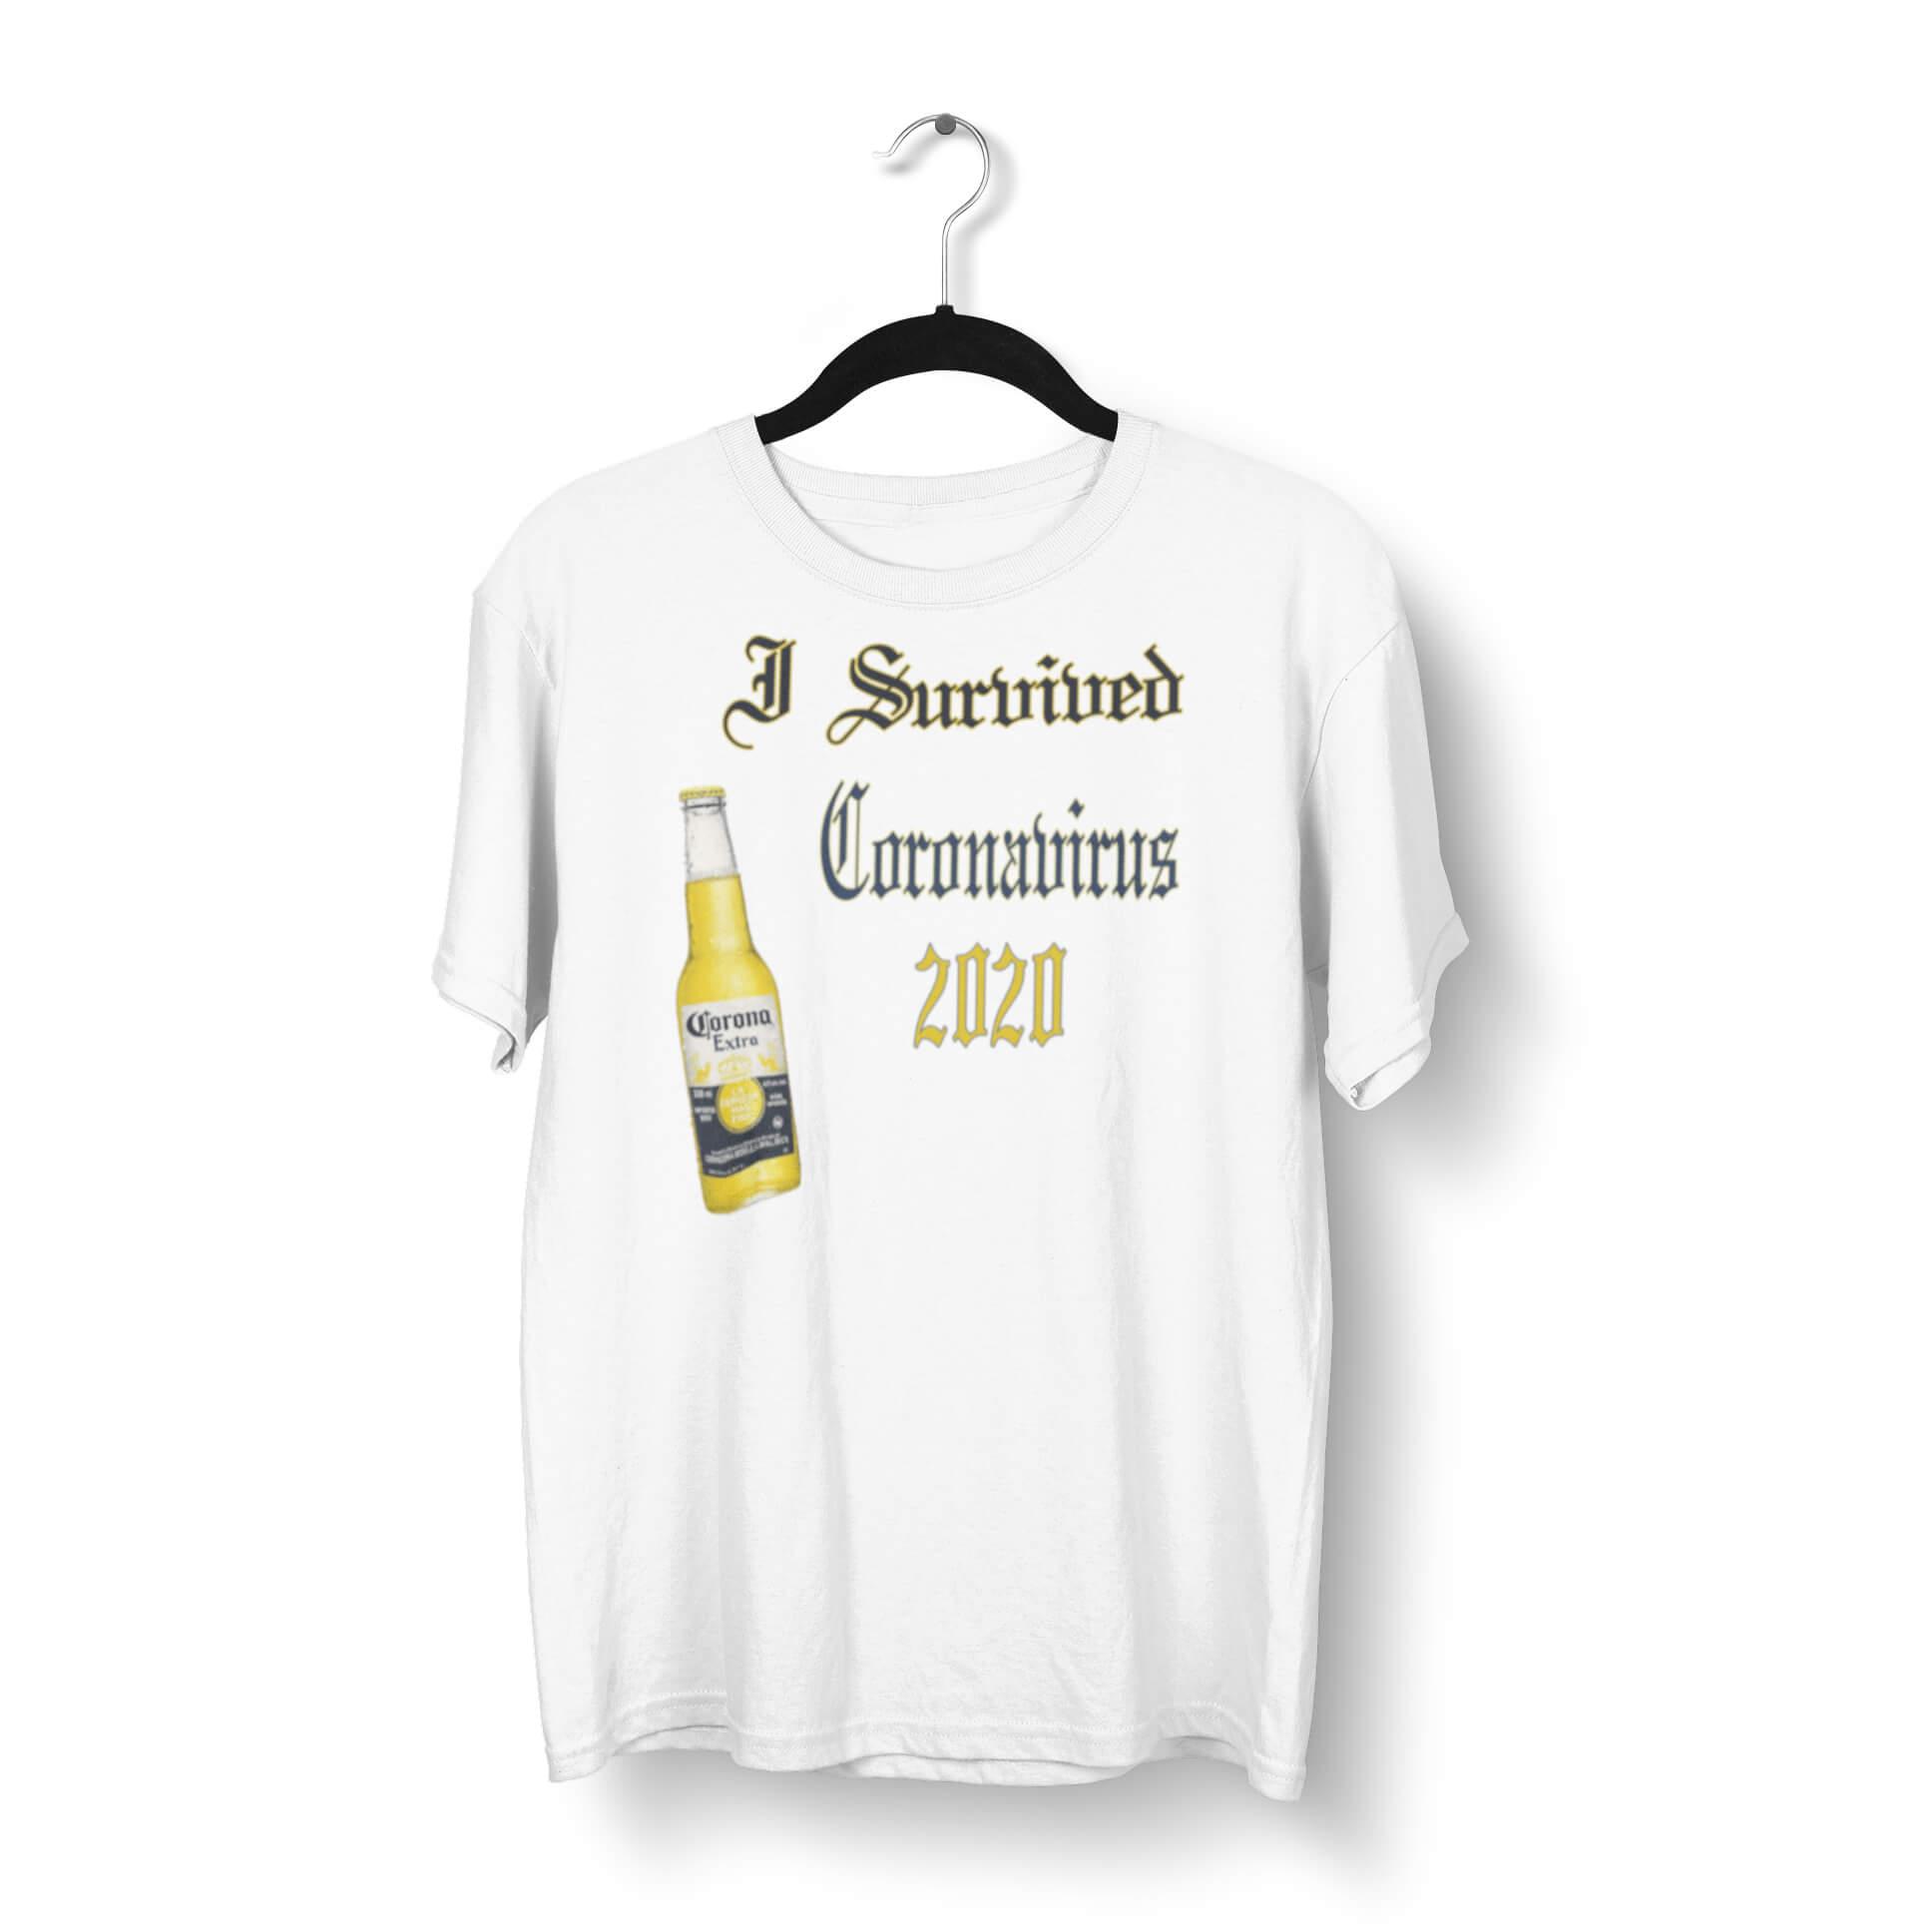 I Survived Coronavirus 2020 T-Shirt